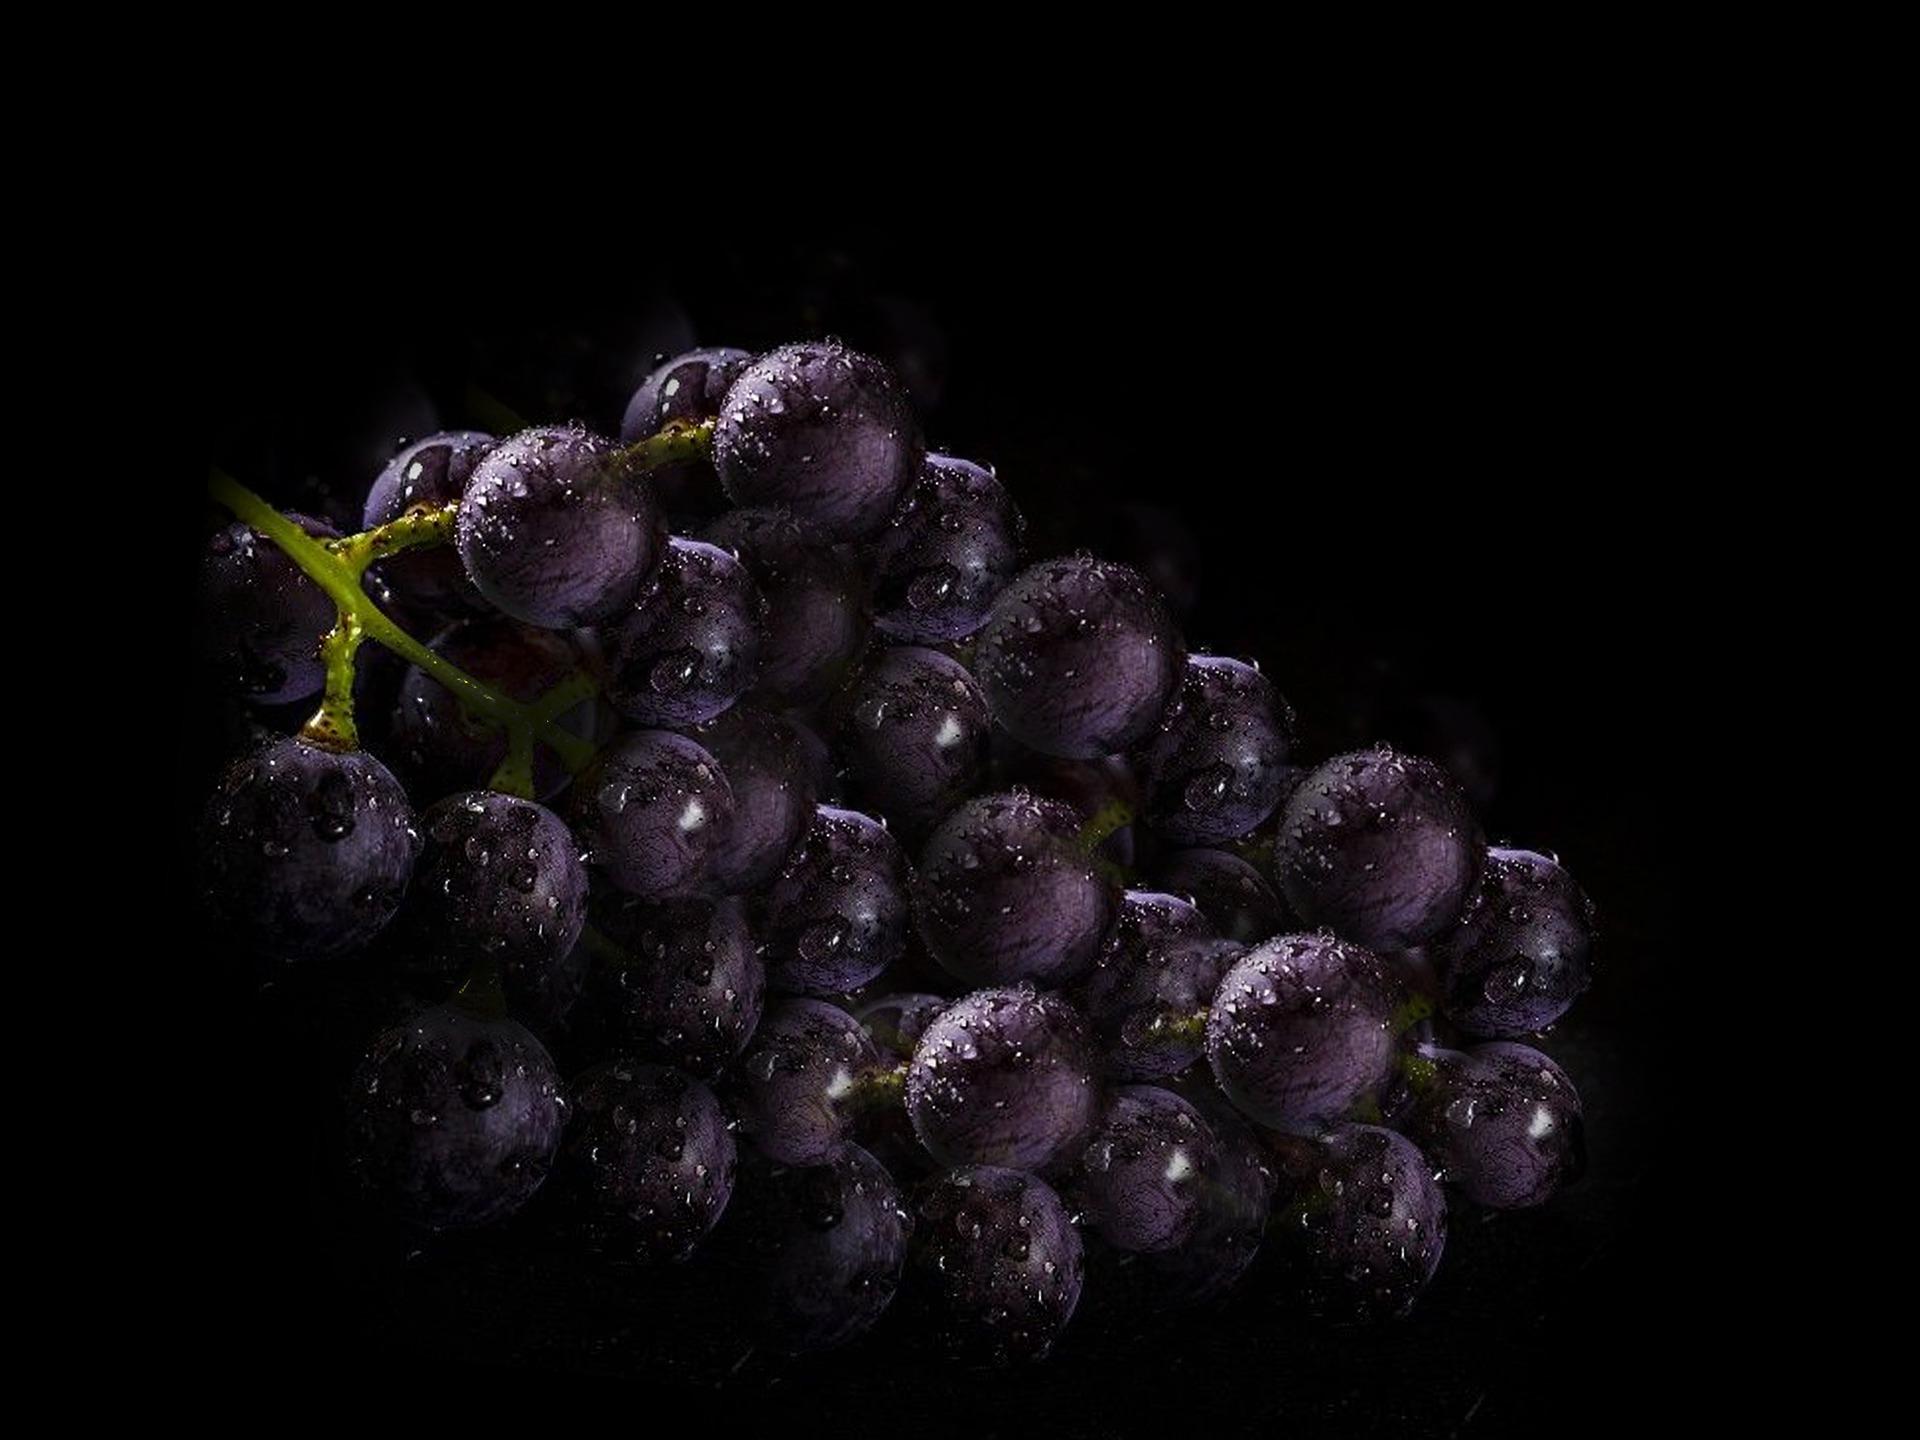 sugoli uva fragola